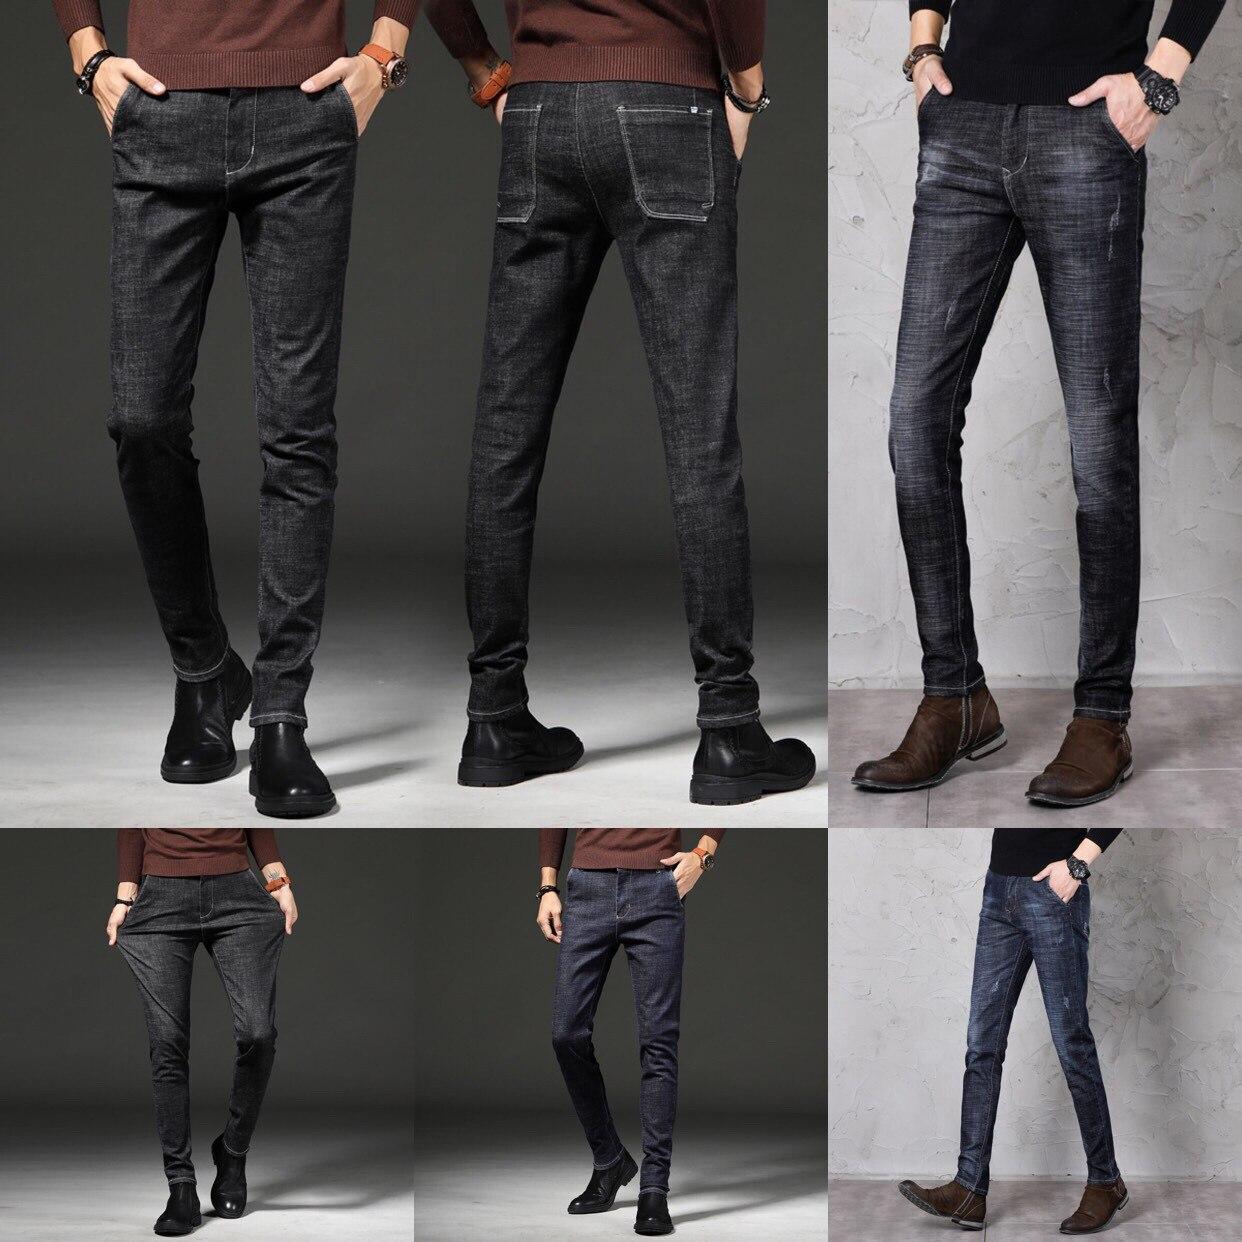 Autumn Jeans Men's Trend 2019 New Style Men Elasticity Casual Slim Fit Long Pants Popular Brand